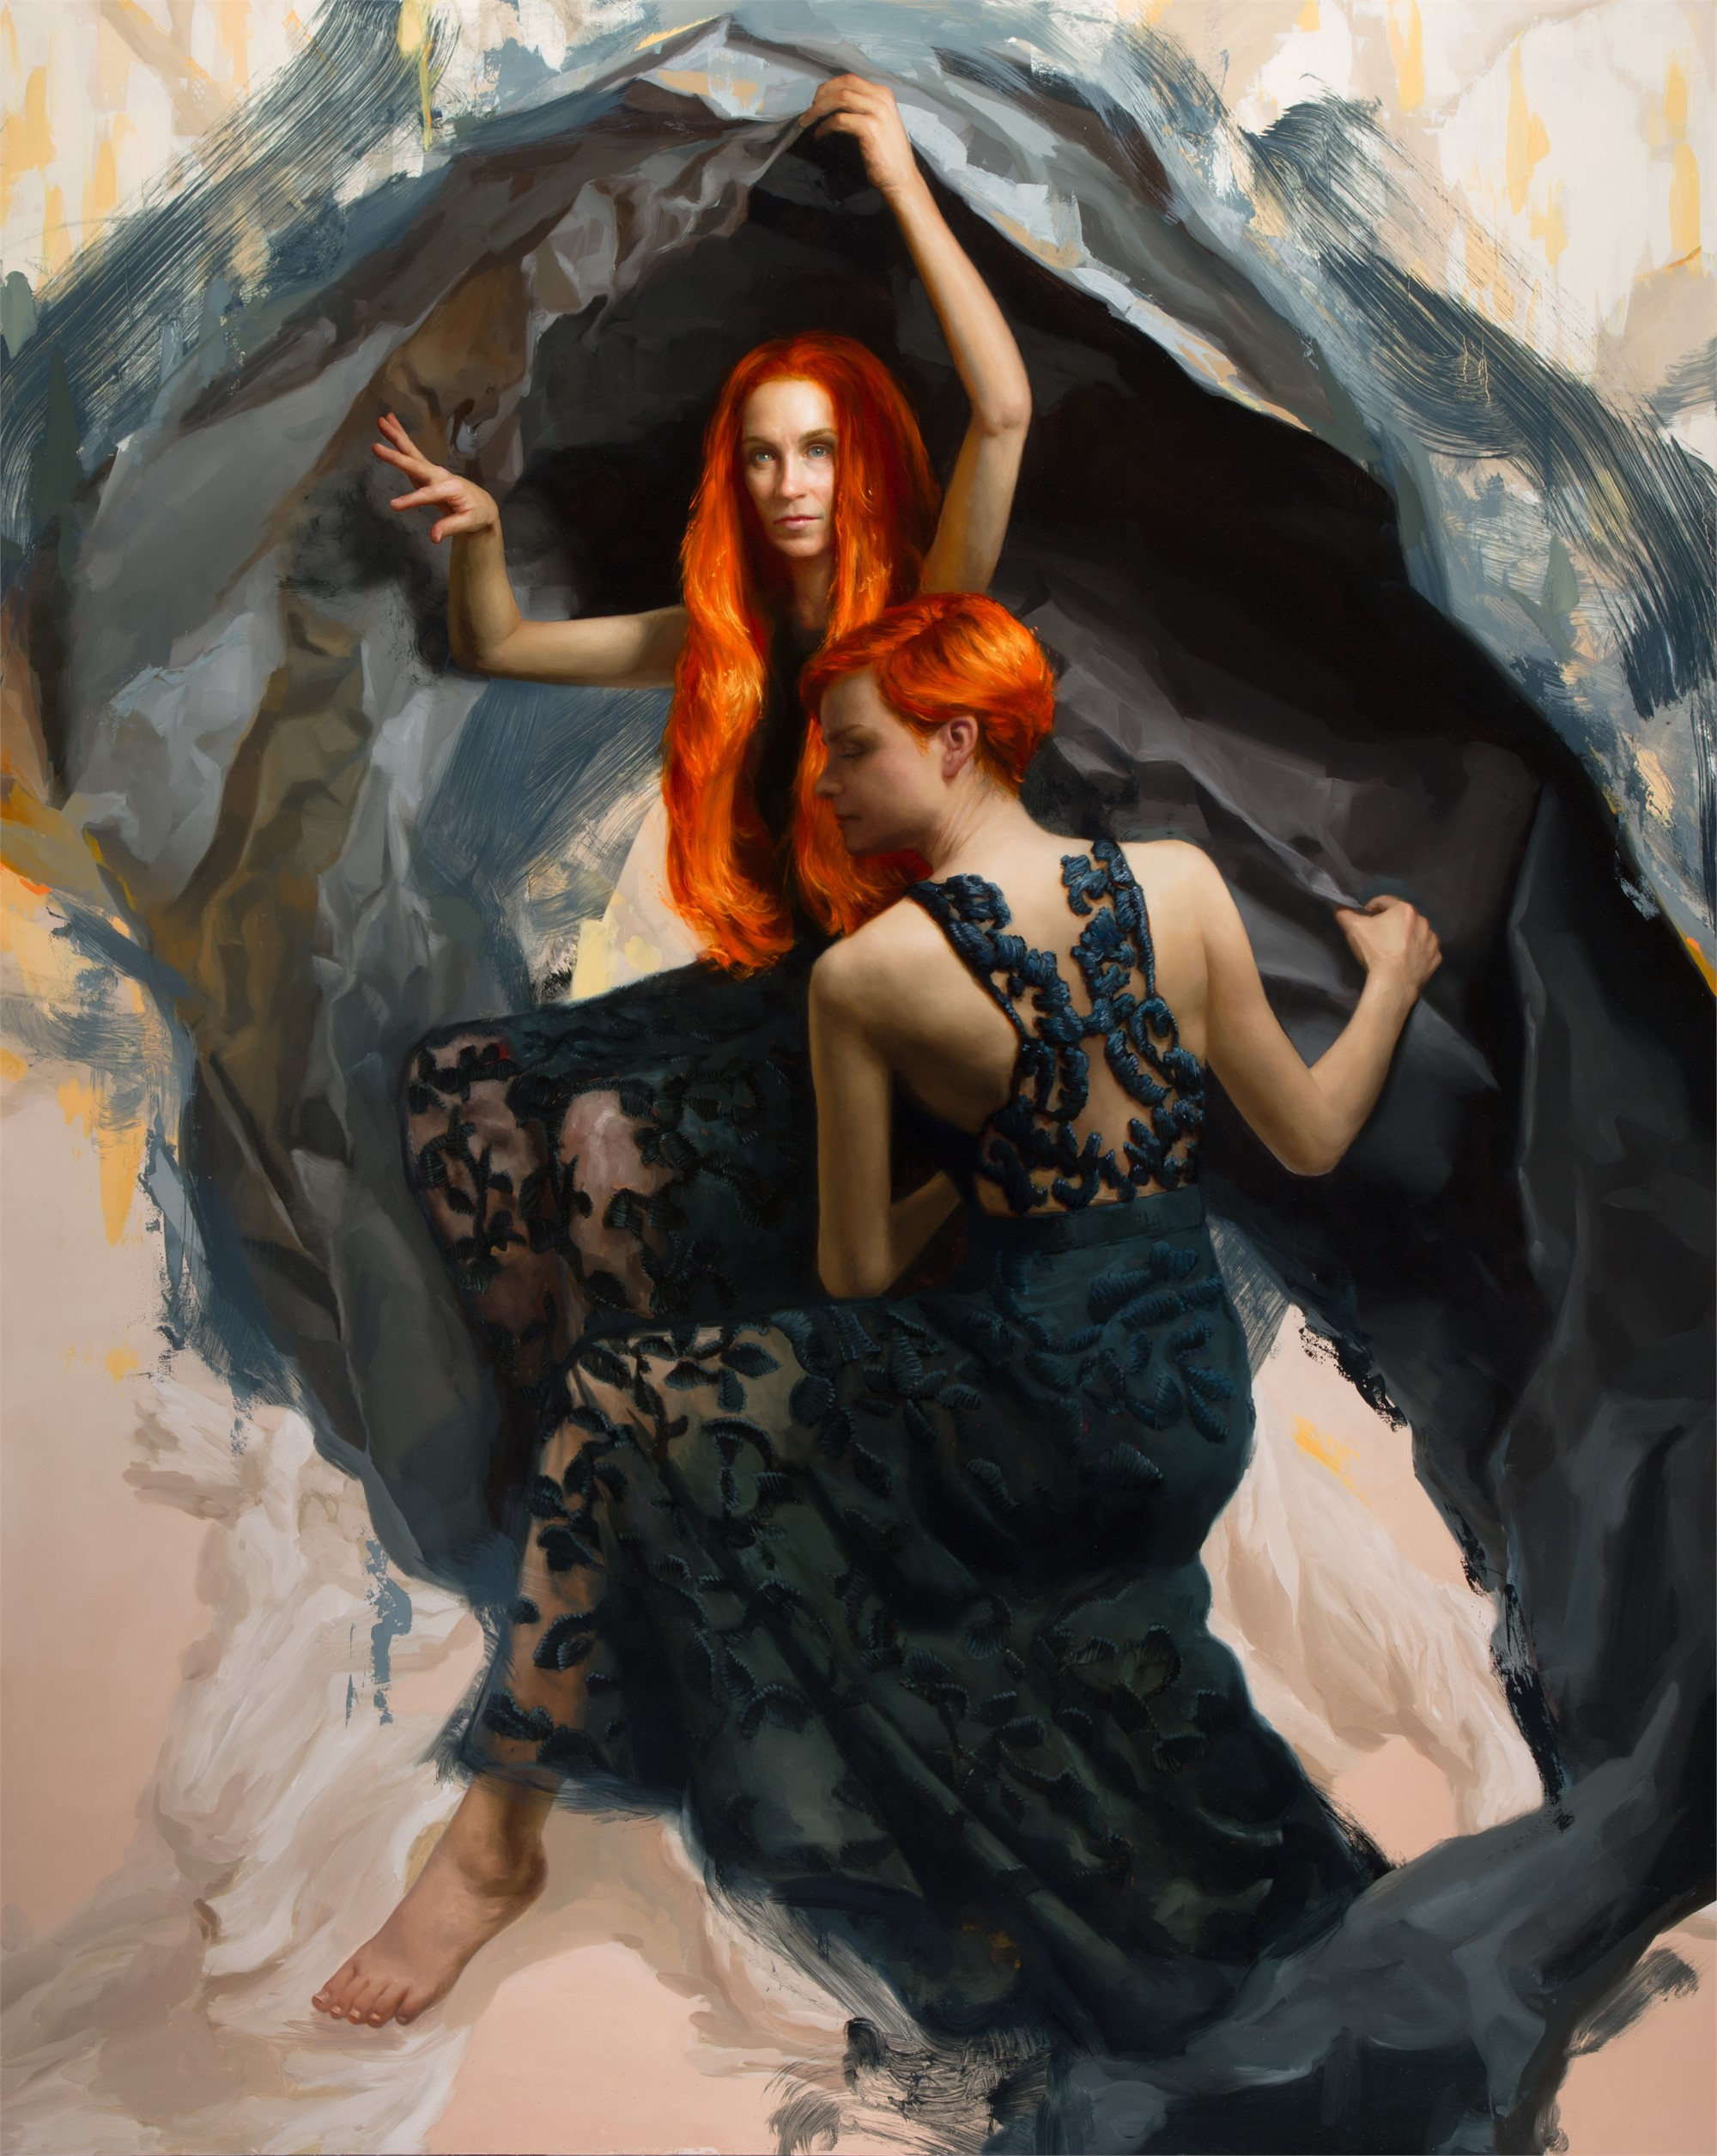 Plume by Elizabeth Zanzinger